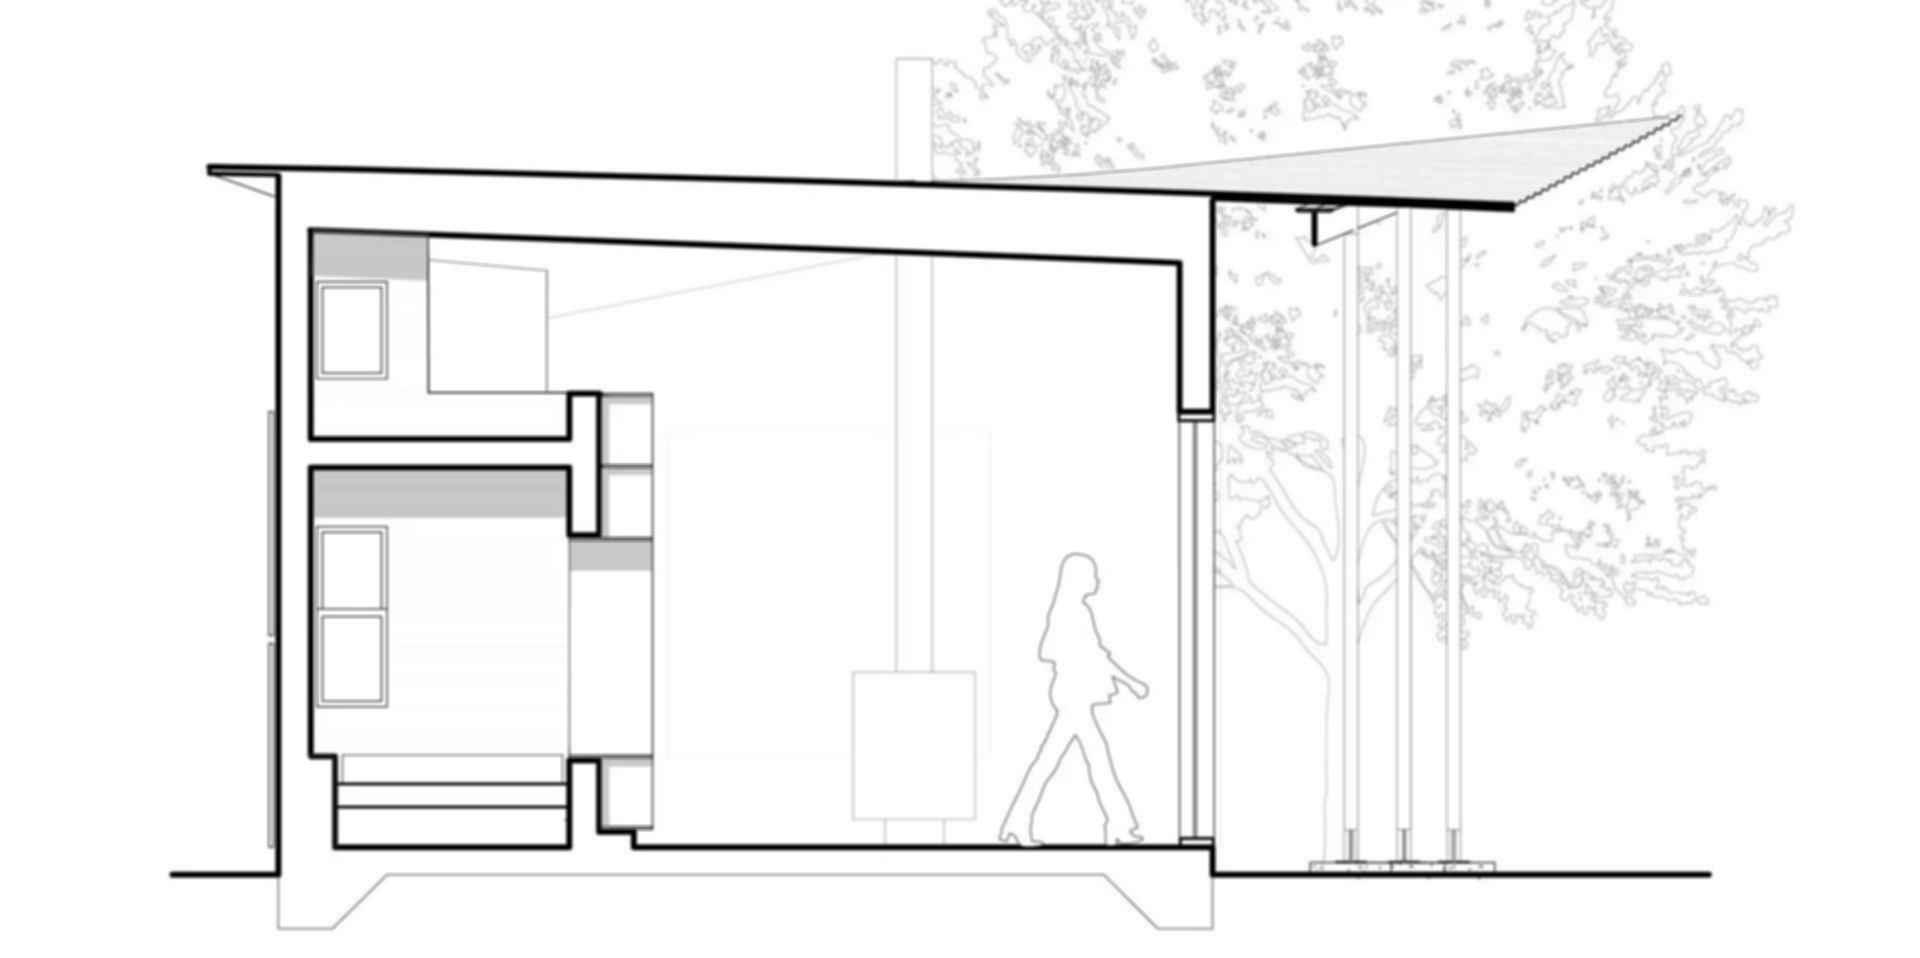 Nakai Residence - Concept Design